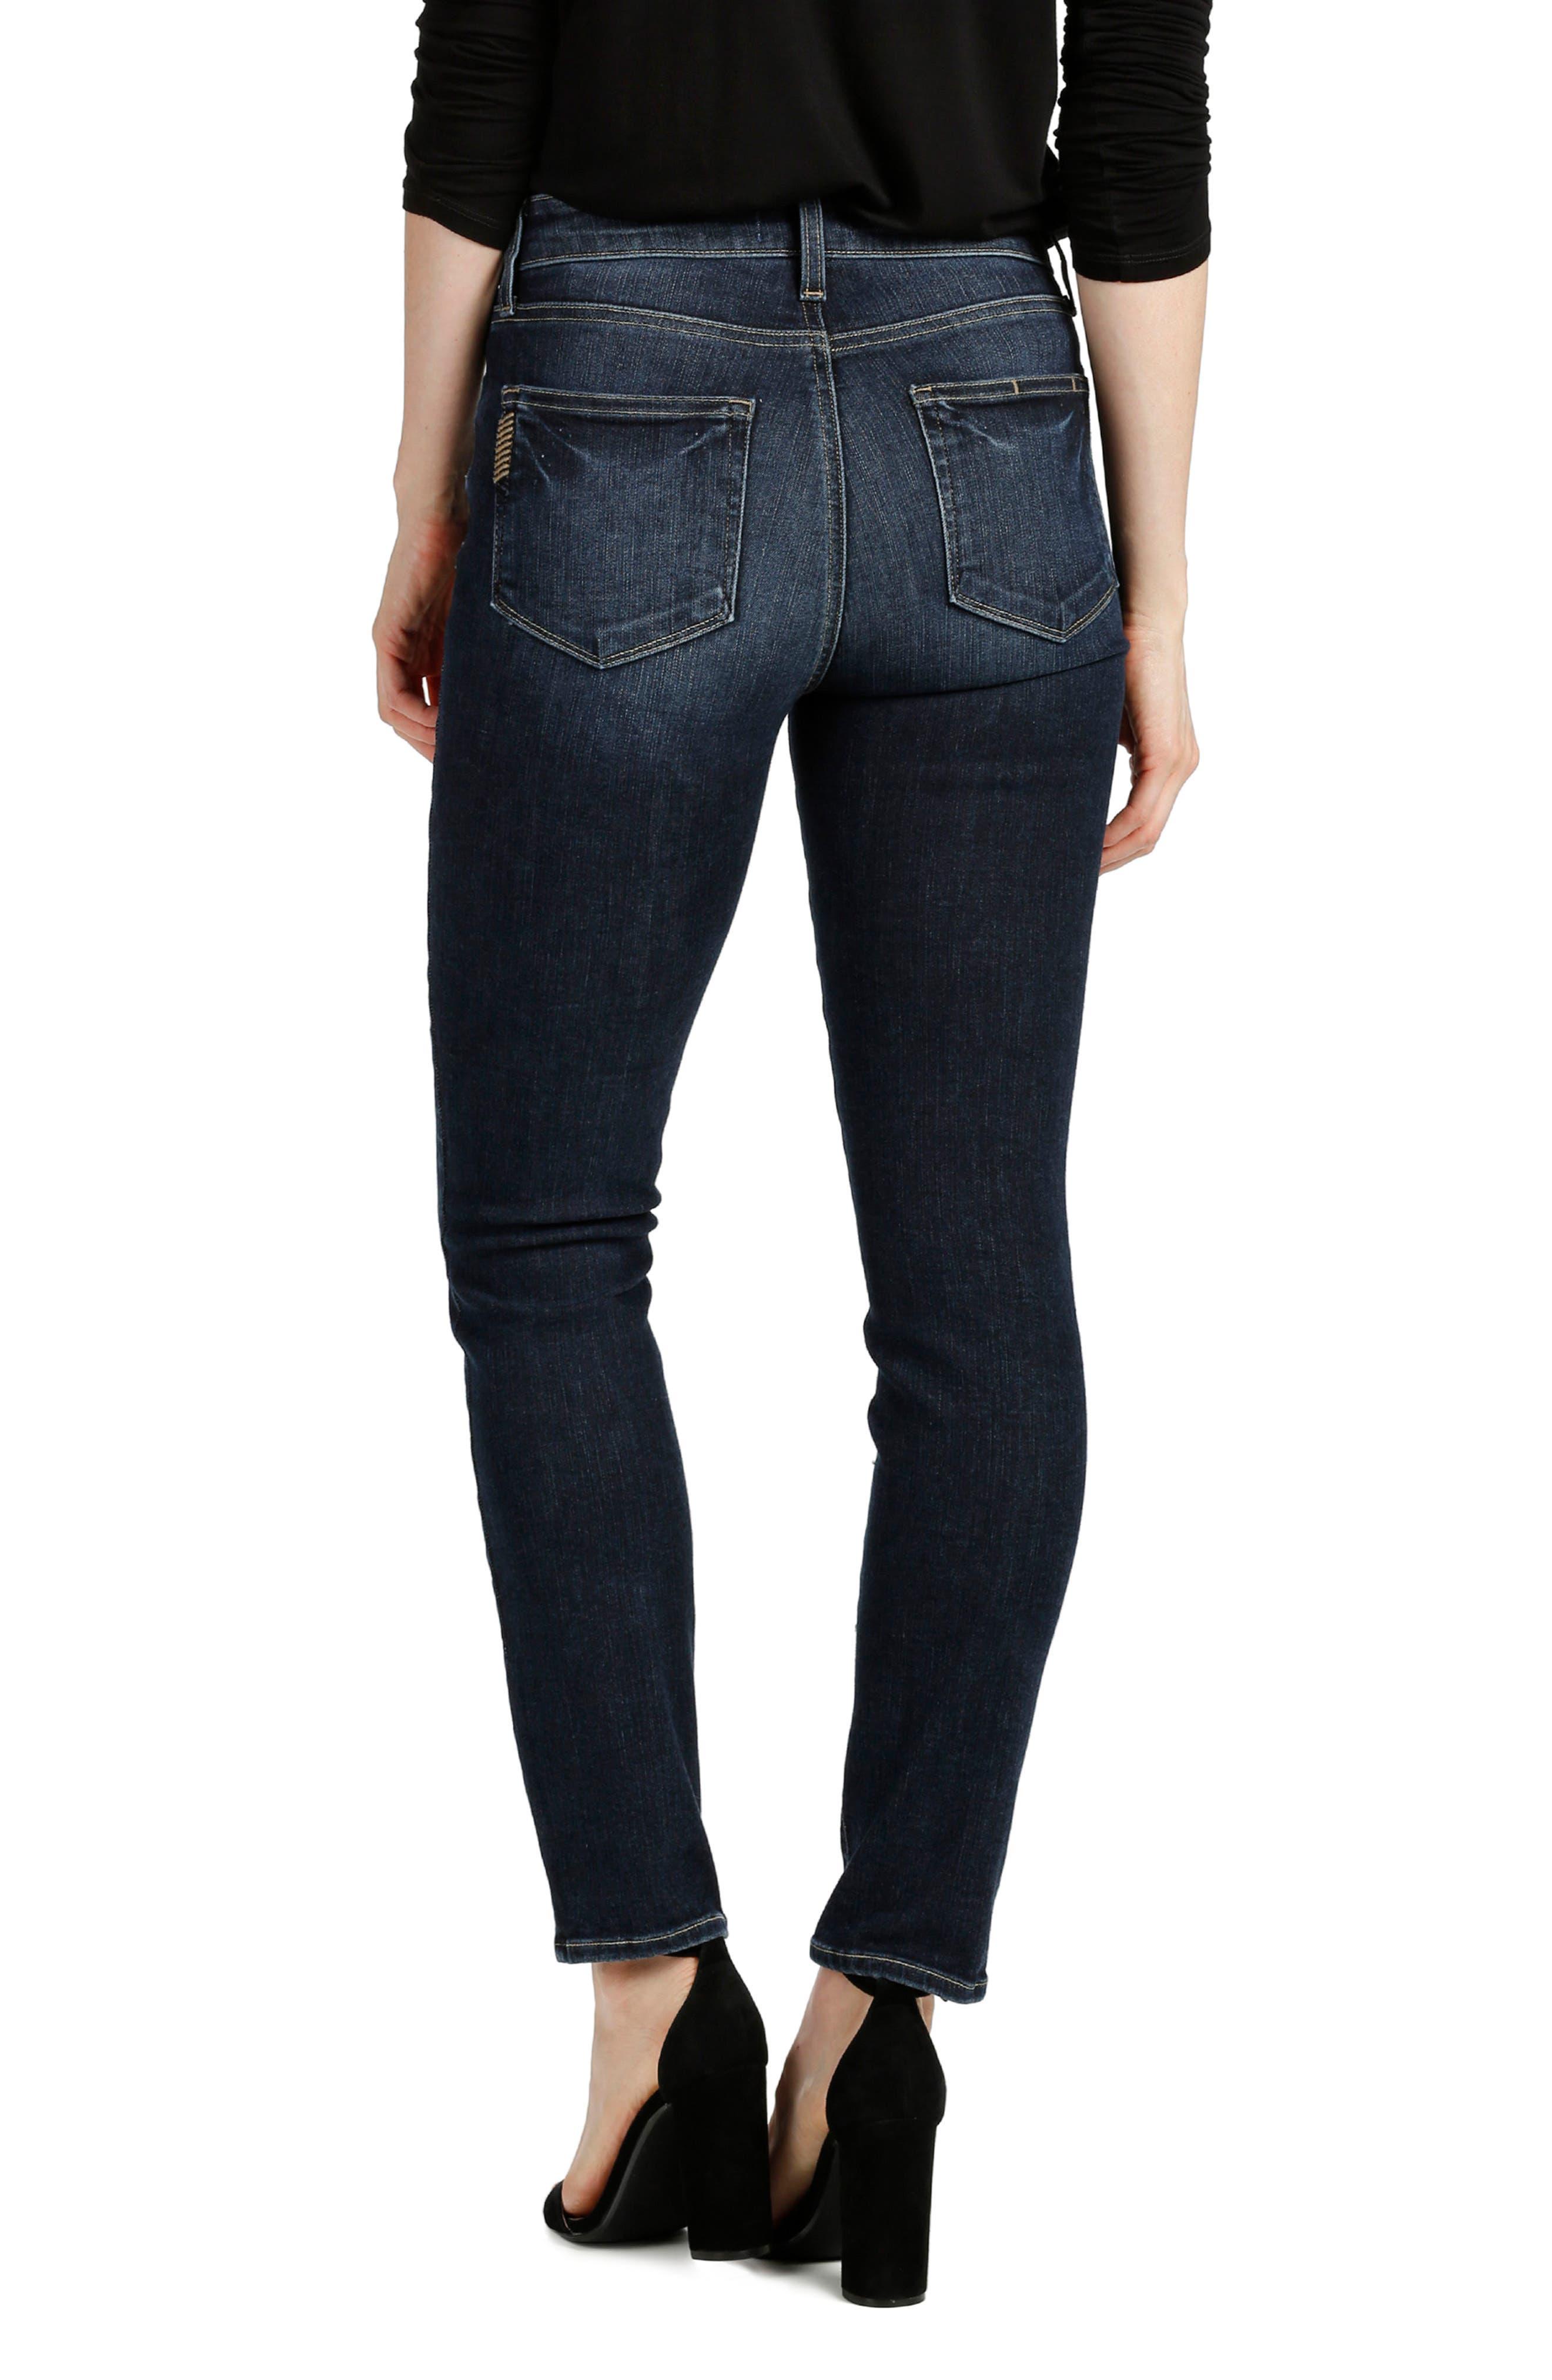 Transcend Vintage - Hoxton Ankle Peg Skinny Jeans,                             Alternate thumbnail 2, color,                             400